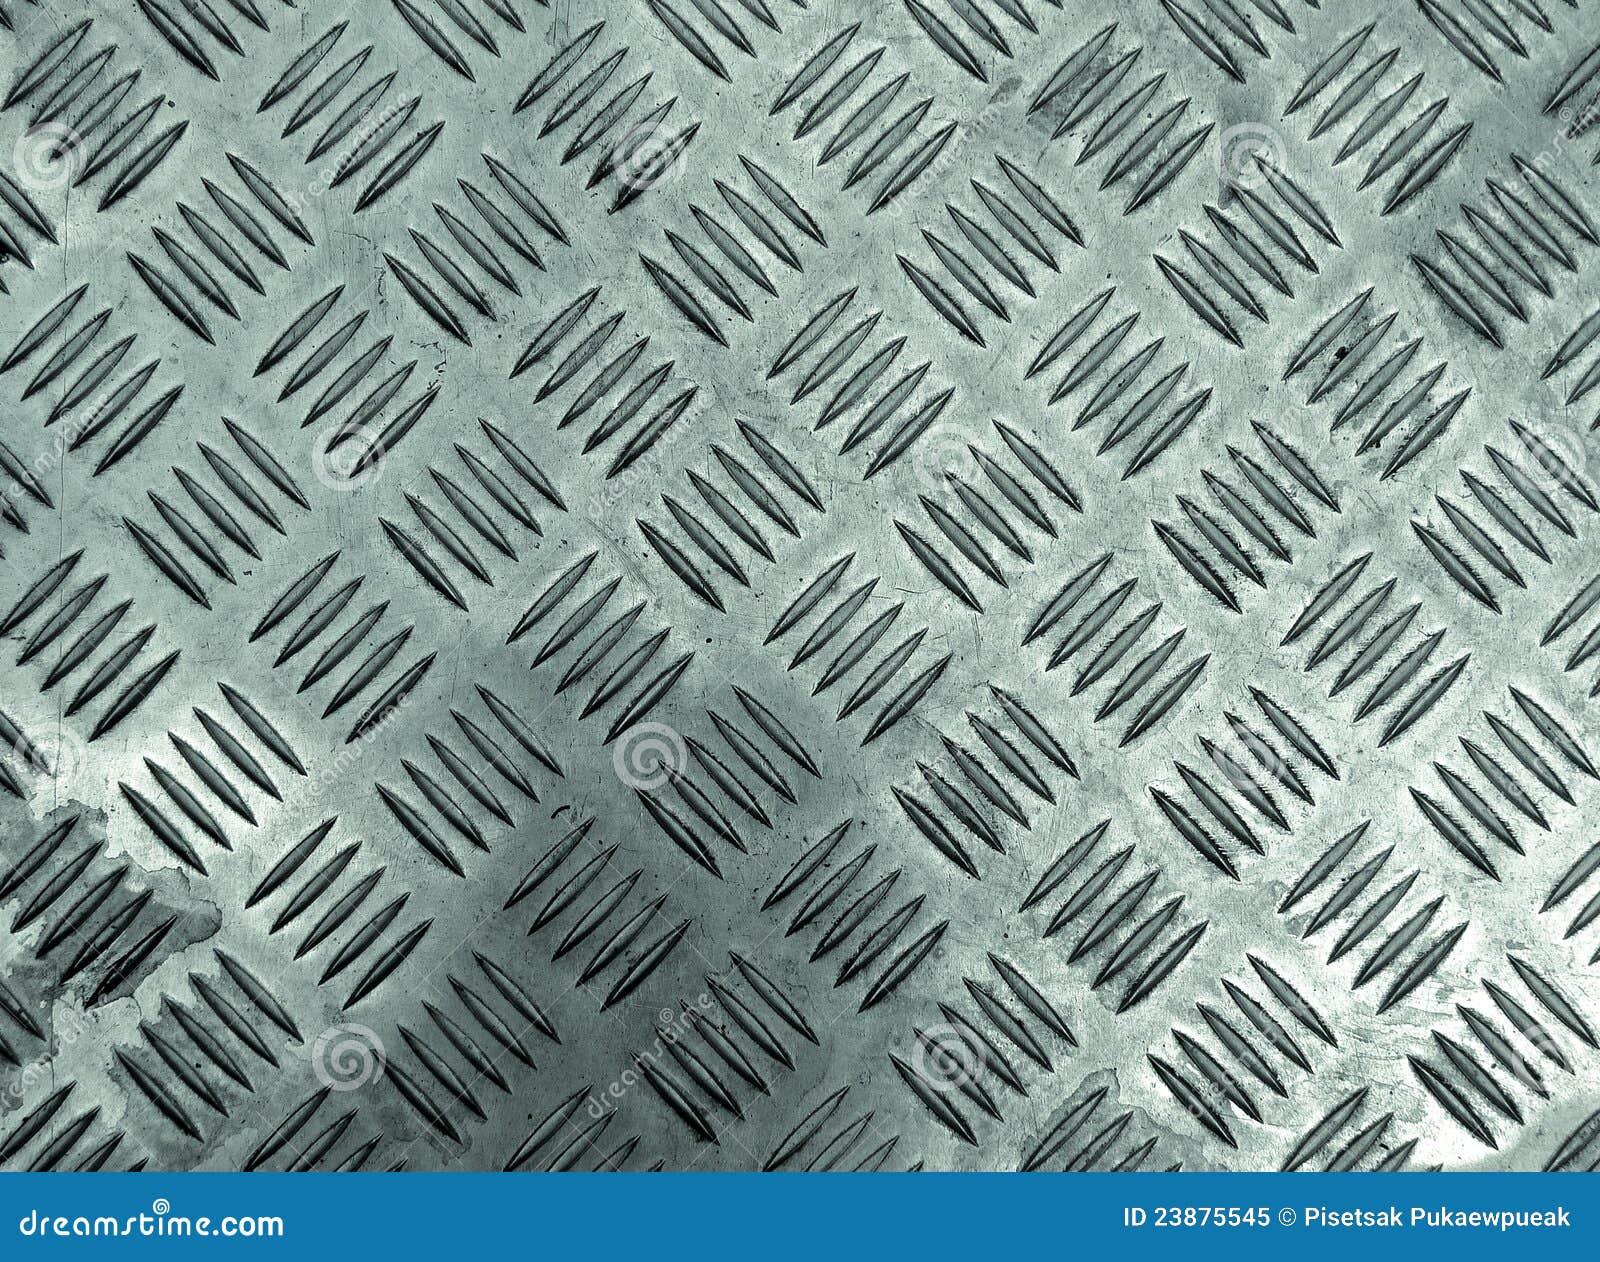 Grunge pattern texture of Metal Plate